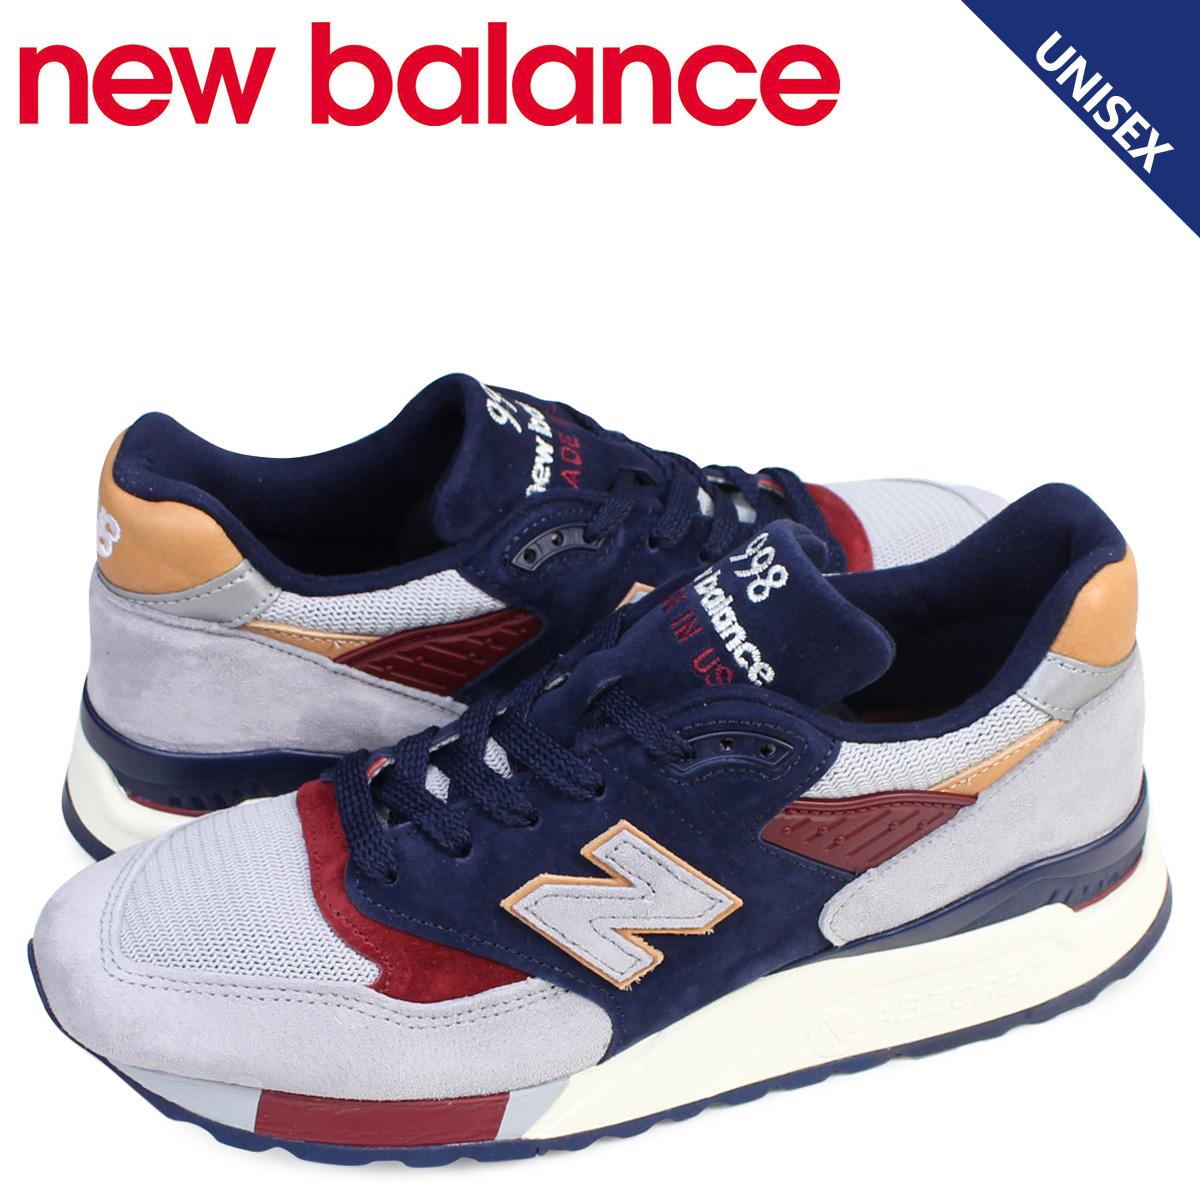 new balance 998 メンズ レディース ニューバランス スニーカー M998CSU Dワイズ MADE IN USA 靴 ネイビー